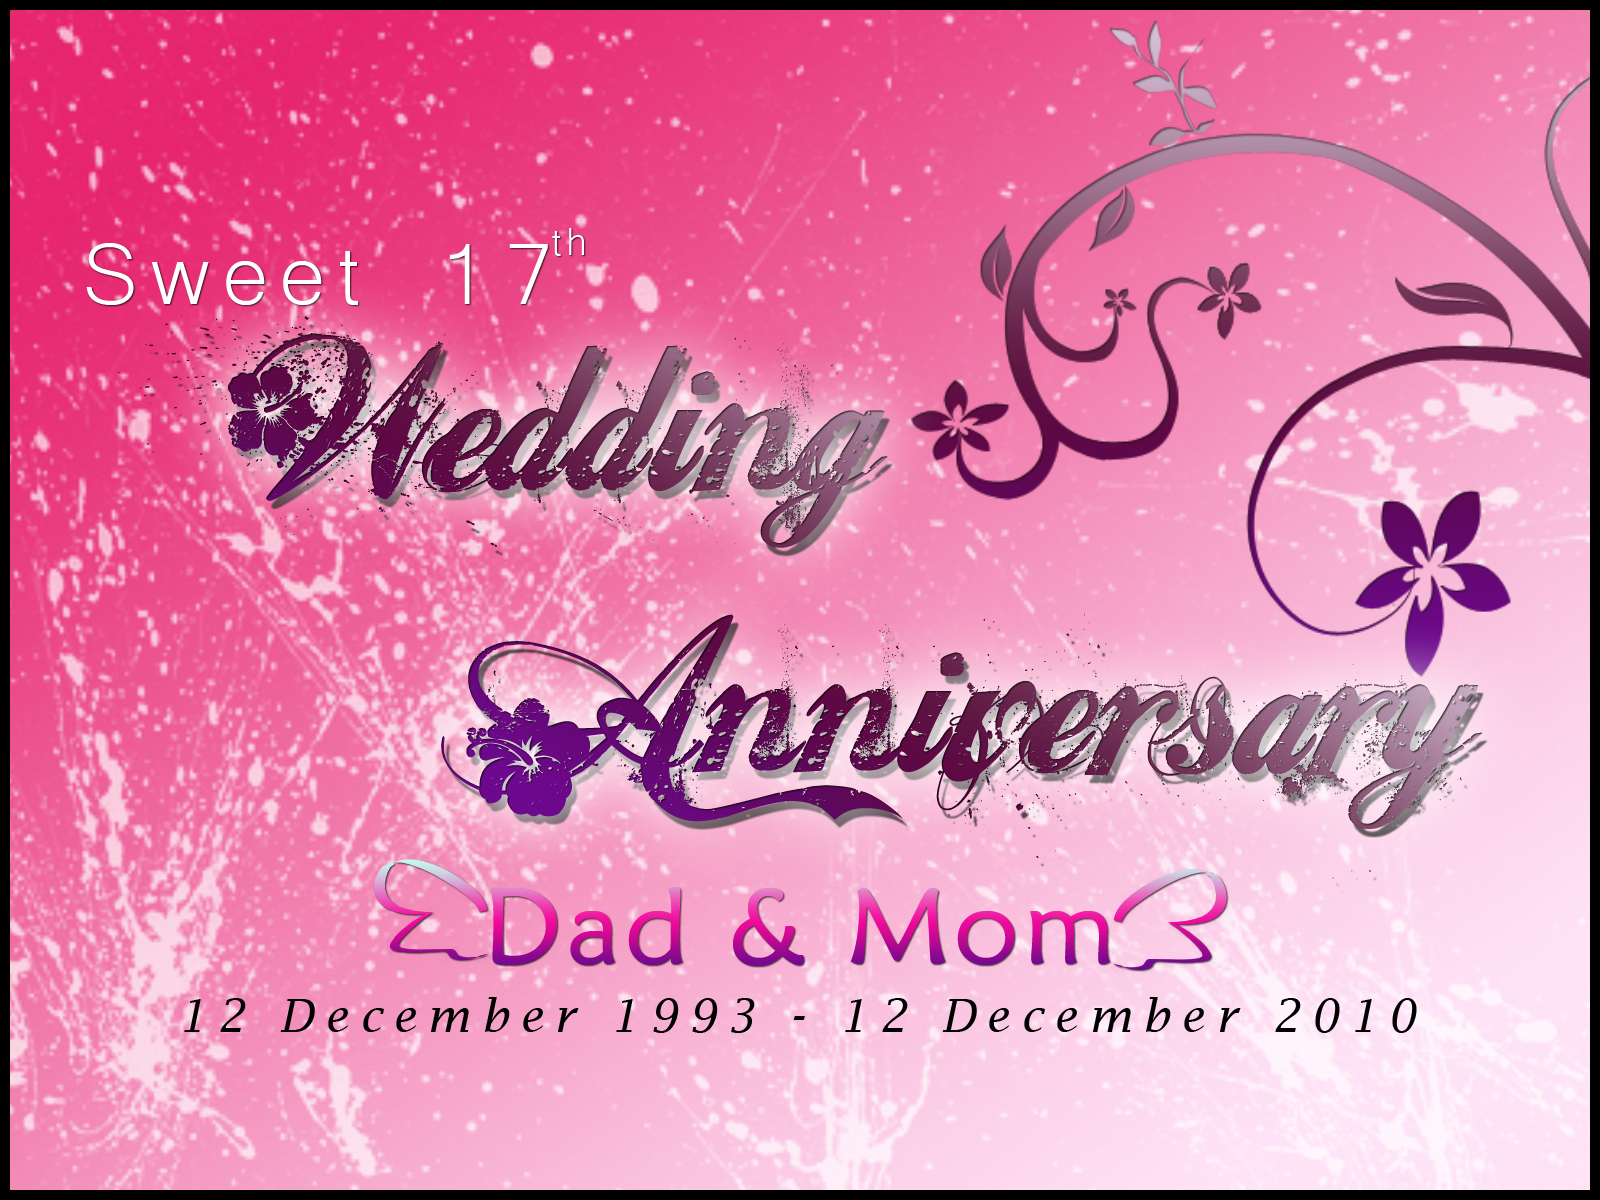 adiheikal&39;s BLOG WEDDING ANNIVERSARY, MY MOM & DAD